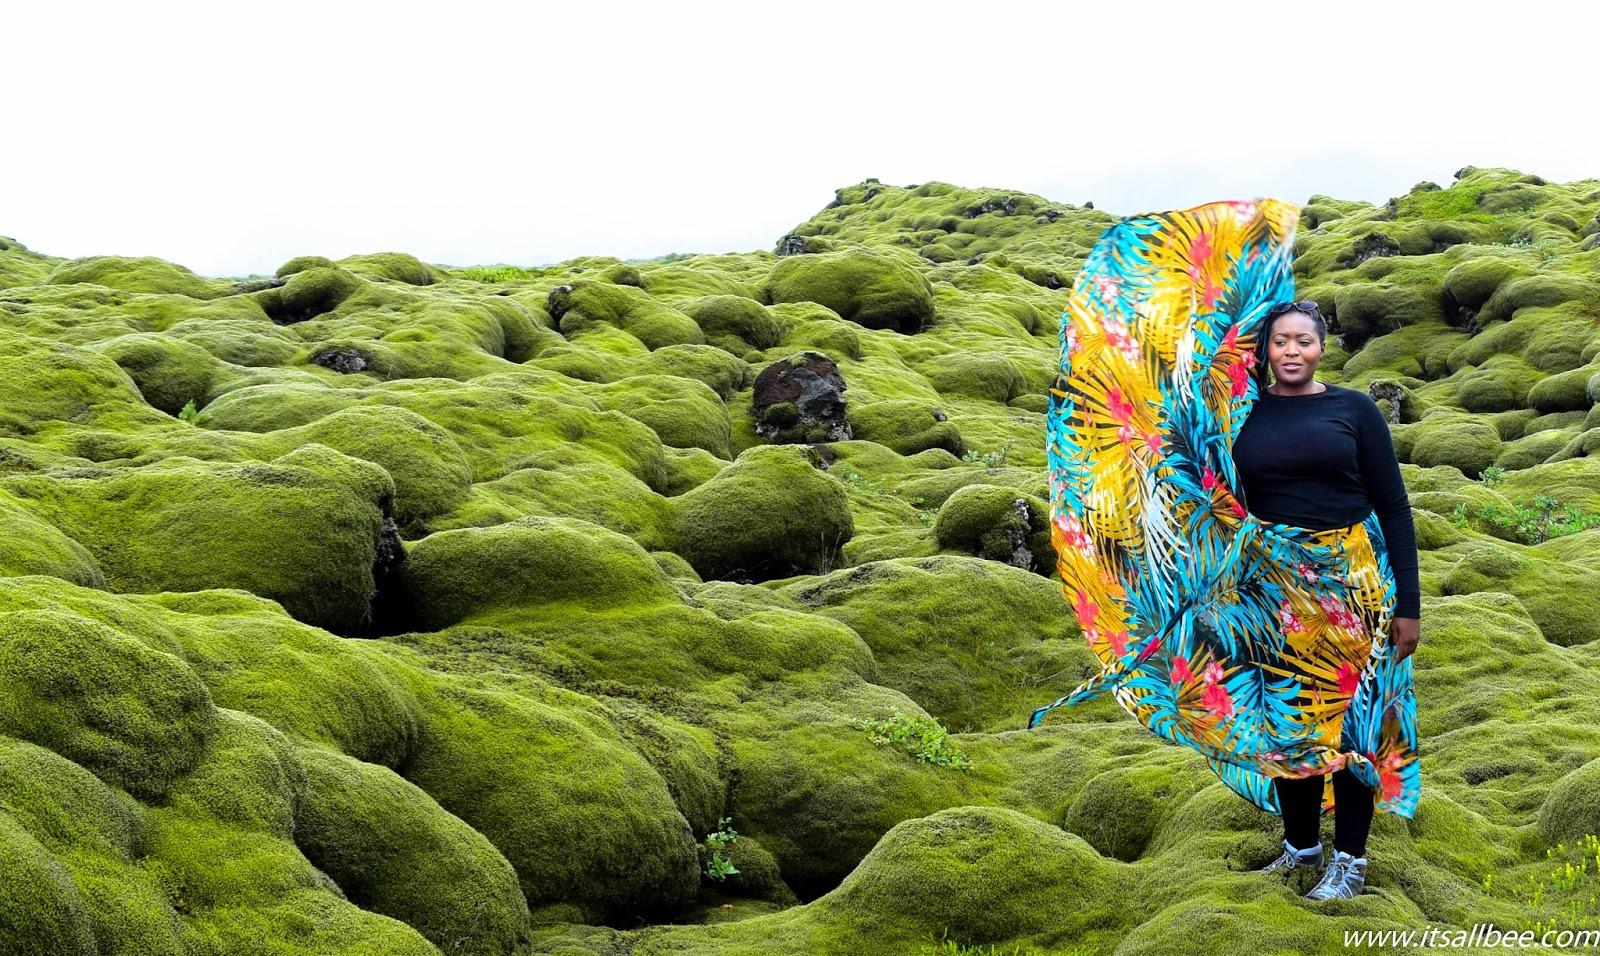 Iceland's Eldhraun Moss Lava Field